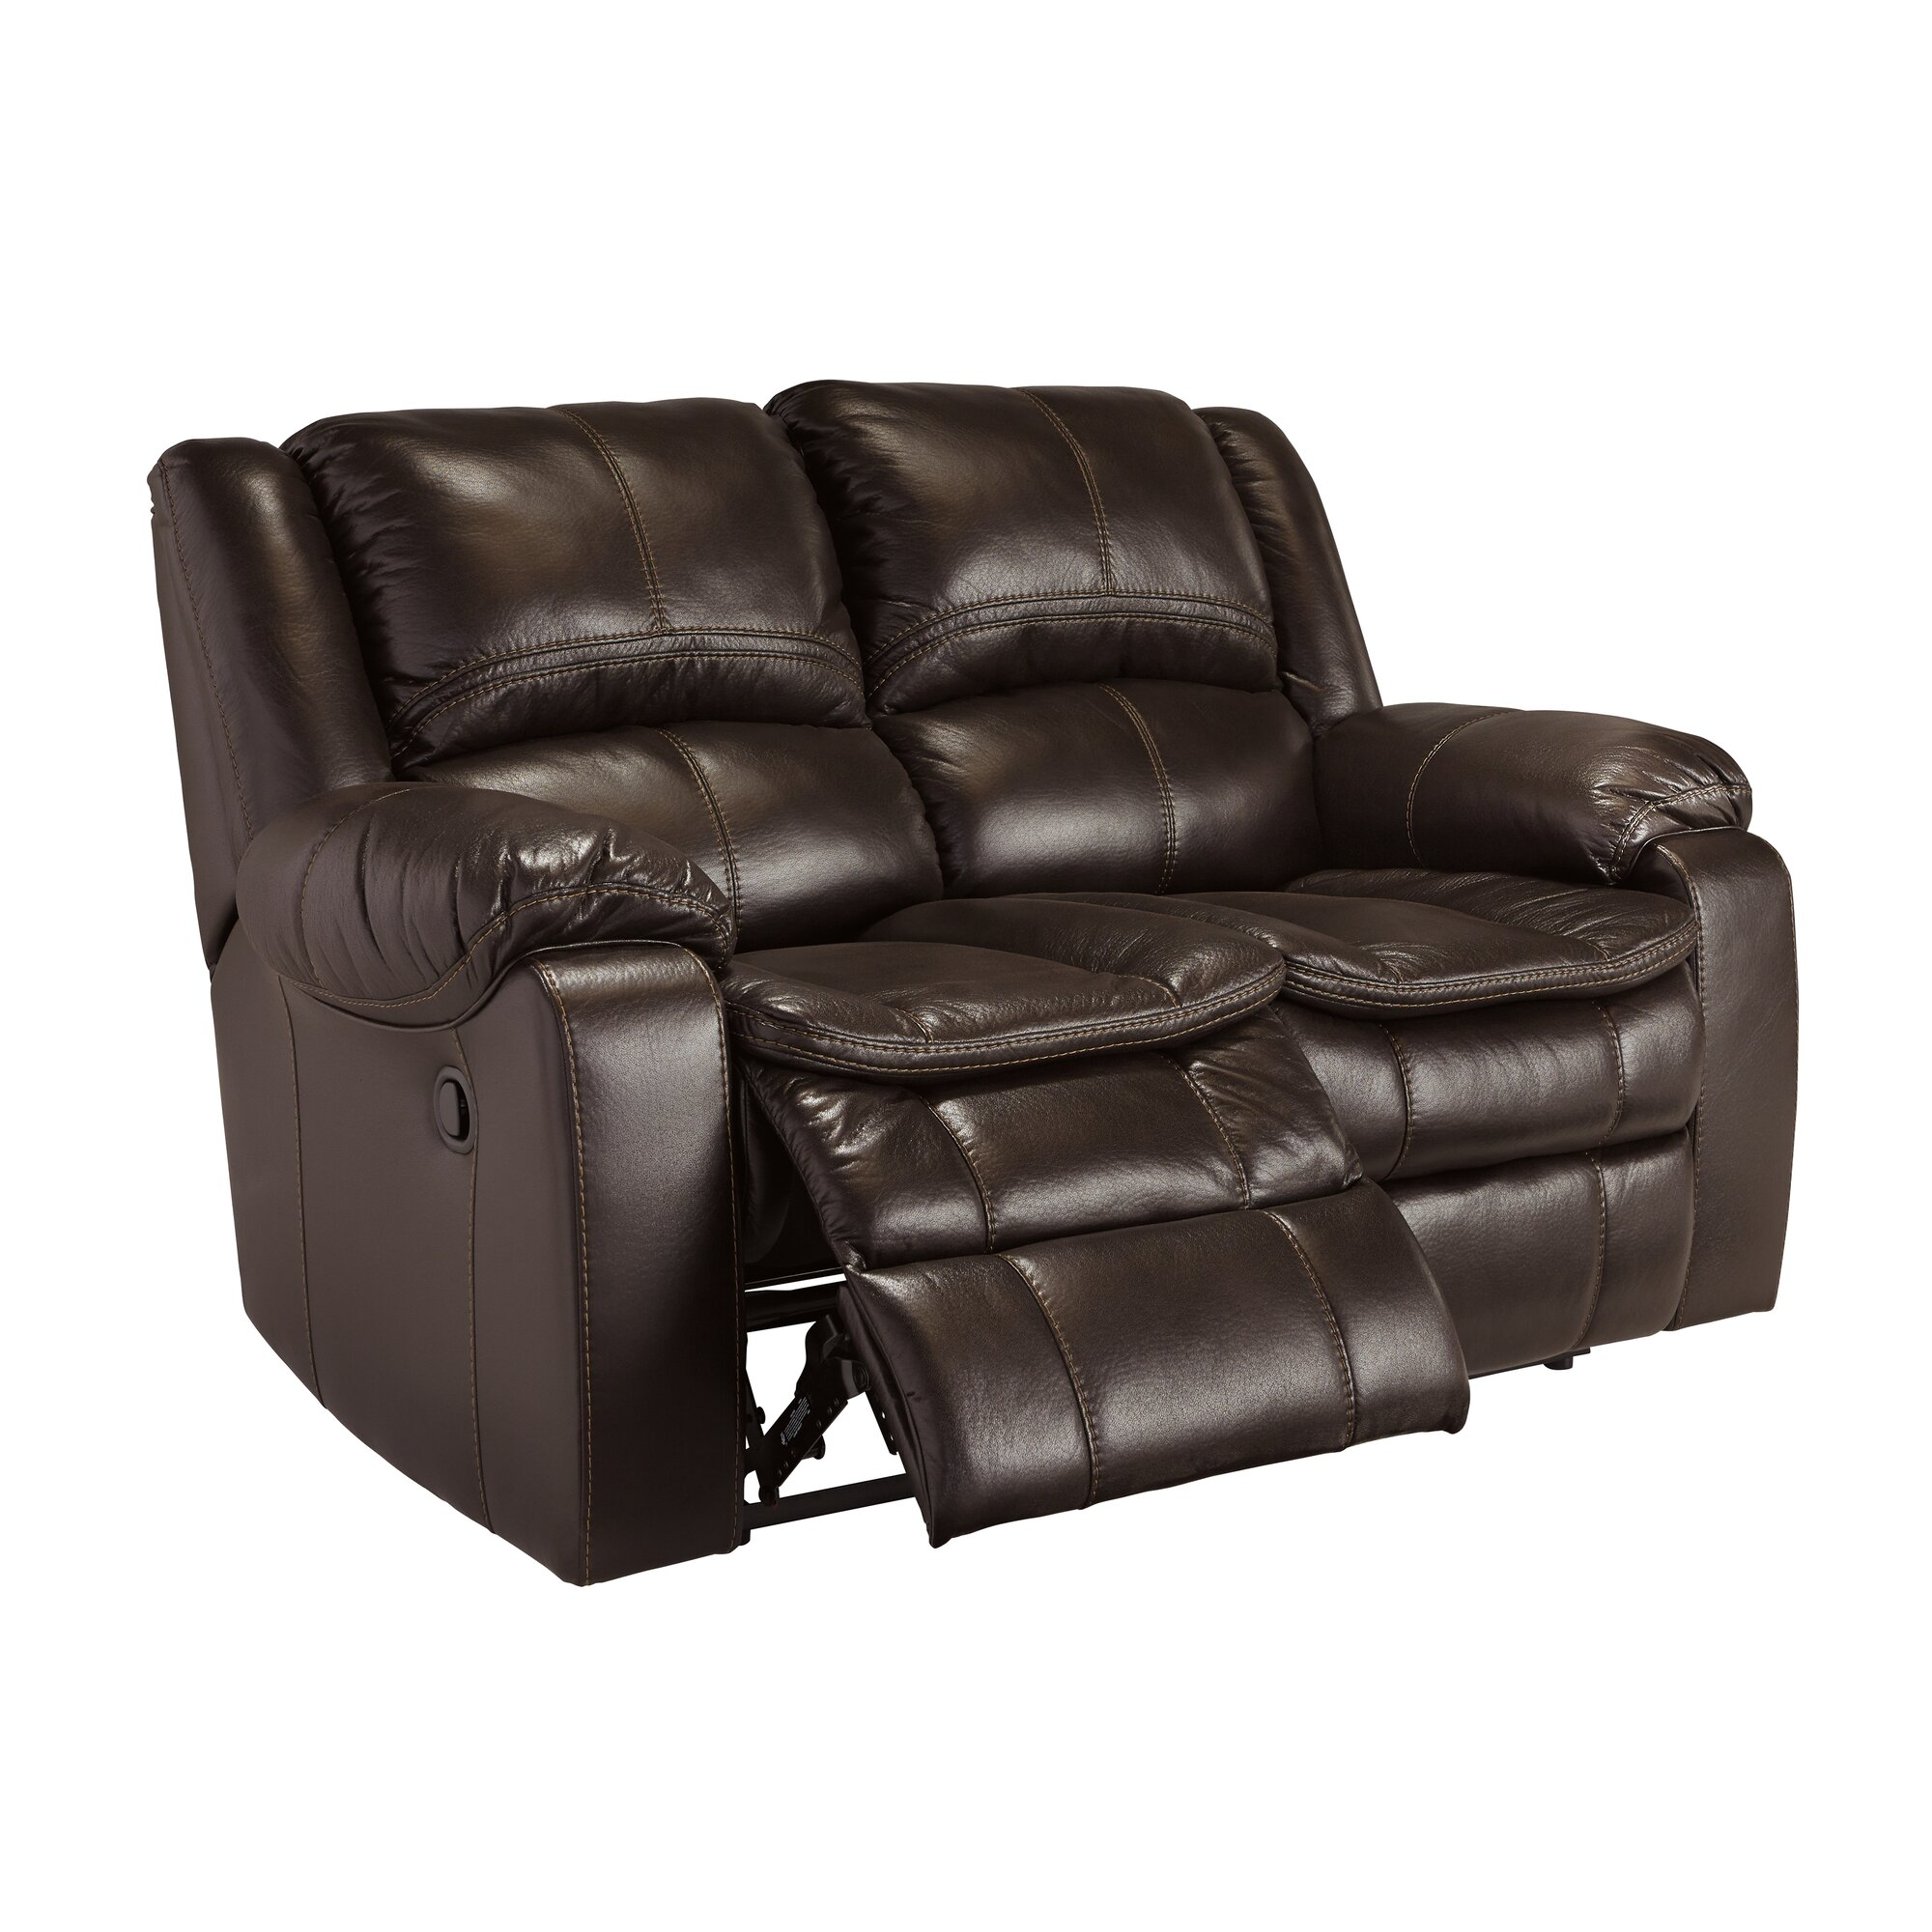 Elegant Replacement Recliner Sofa Sectional Mech Mechanism